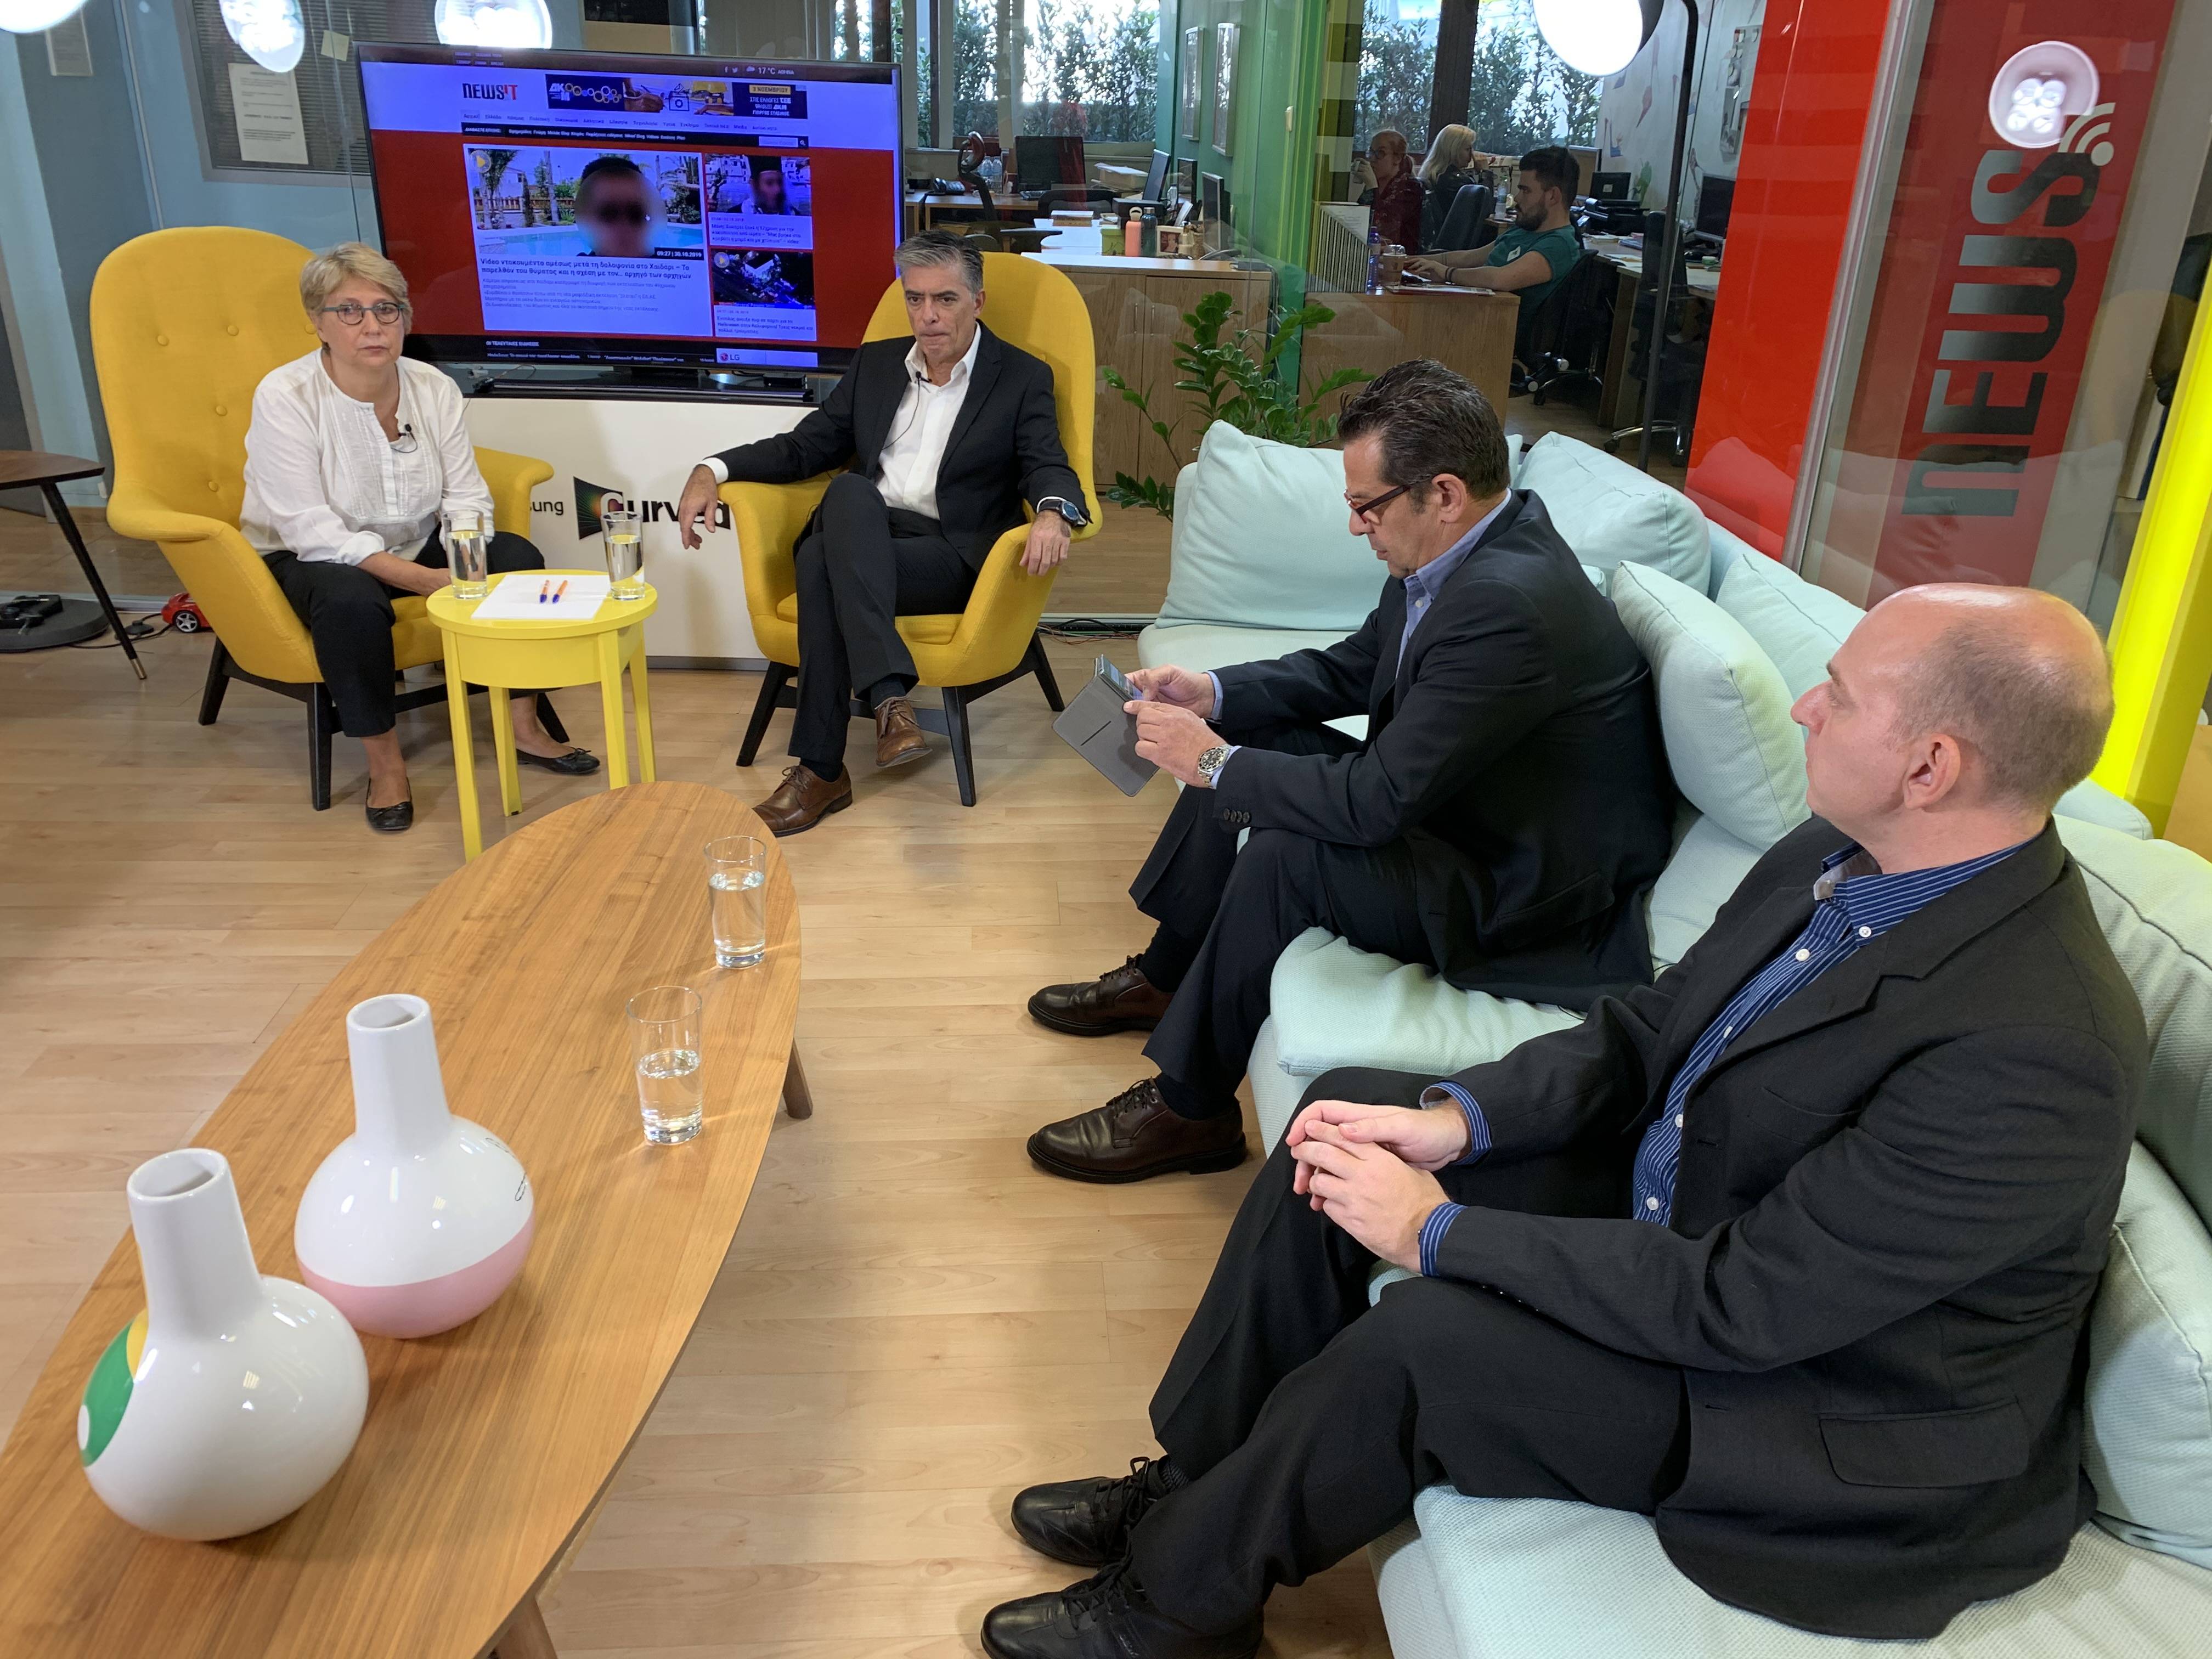 Newsit – Σύσκεψη: Η Προανακριτική, ο Πολάκης, ο Τζανακόπουλος και το πετρέλαιο θέρμανσης